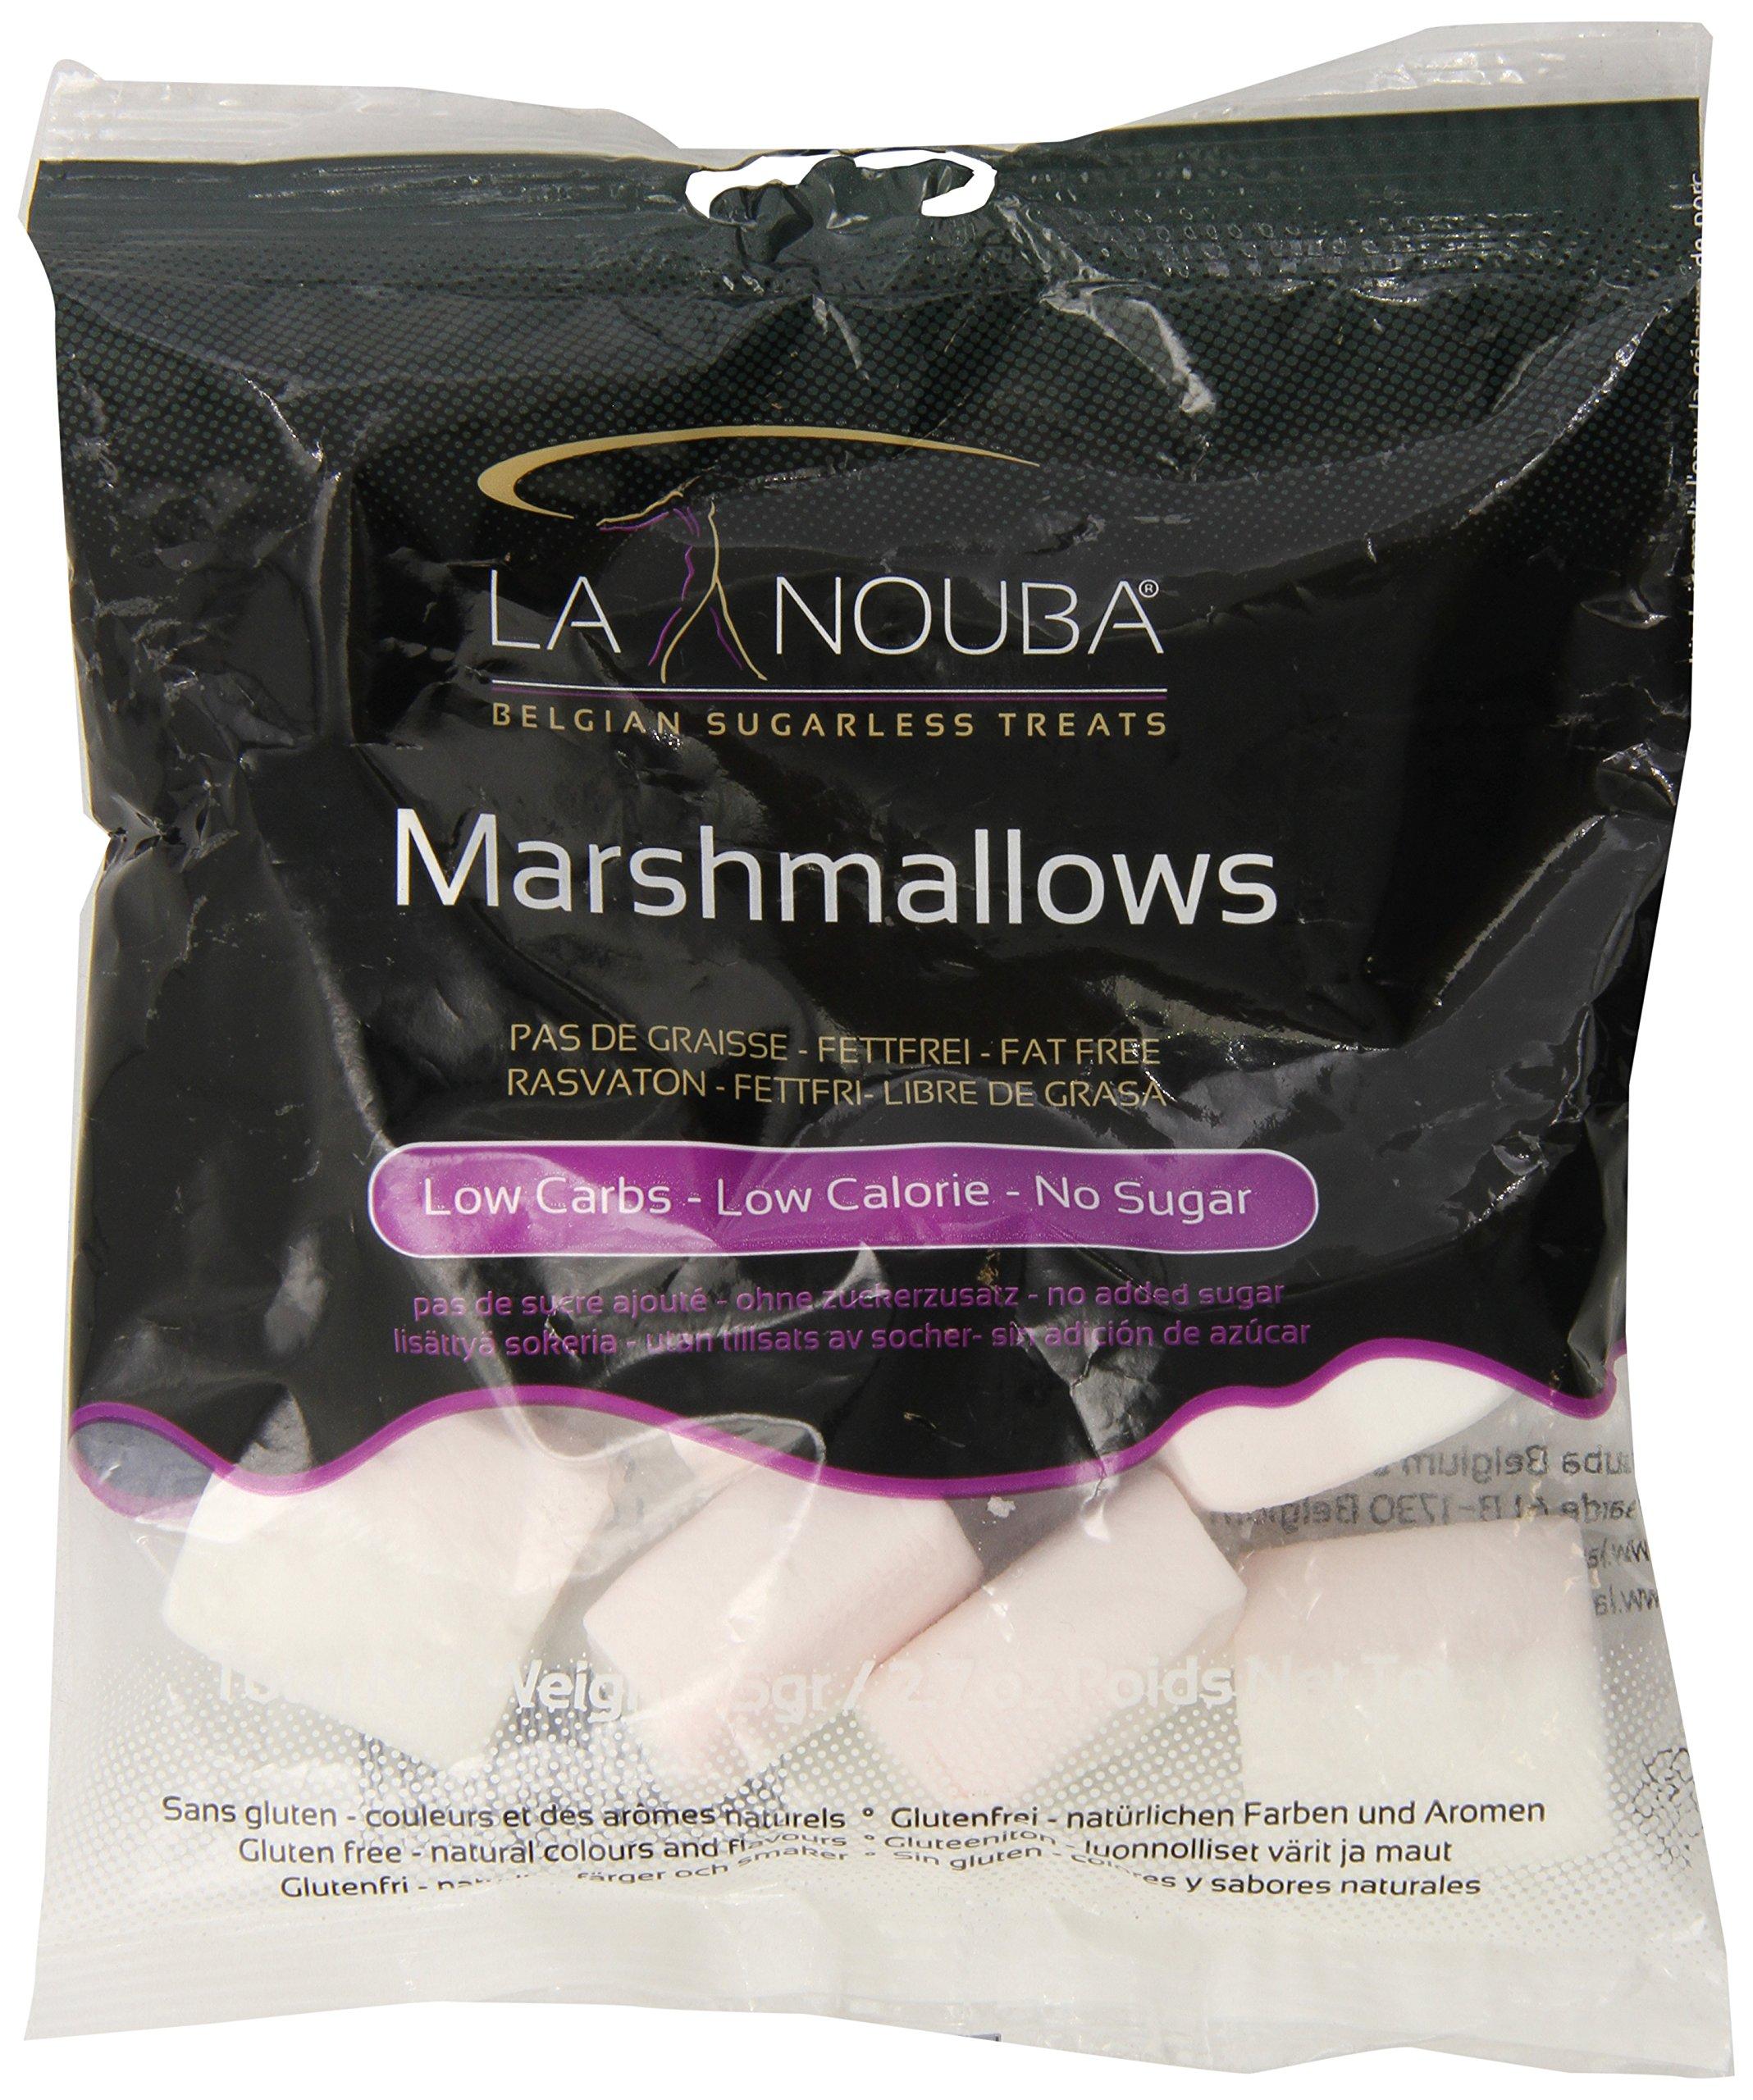 Marshmallows Sugar/Gluten Free Sugar Free Marshmellow 2.7 OZ by La Nouba